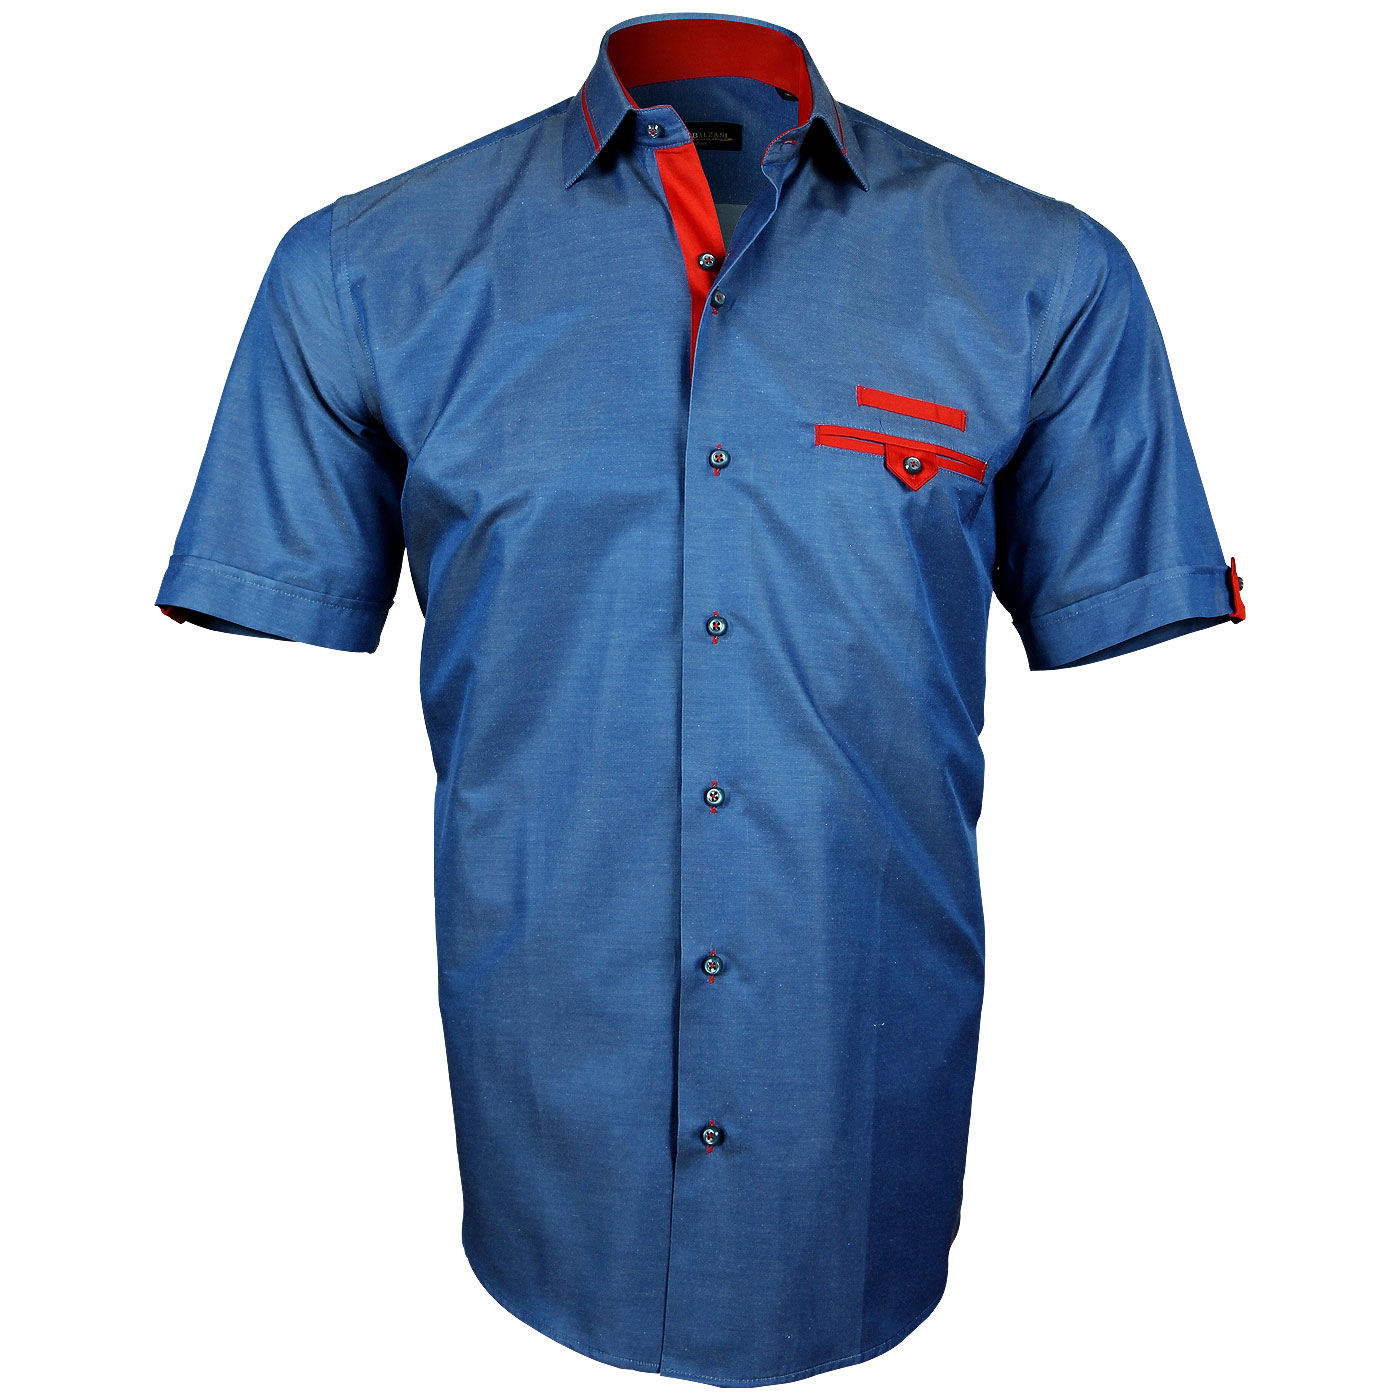 Chemise italienne chemiseweb le sp cialiste de la chemise italienne - Chemise homme fashion coupe italienne cintree ...